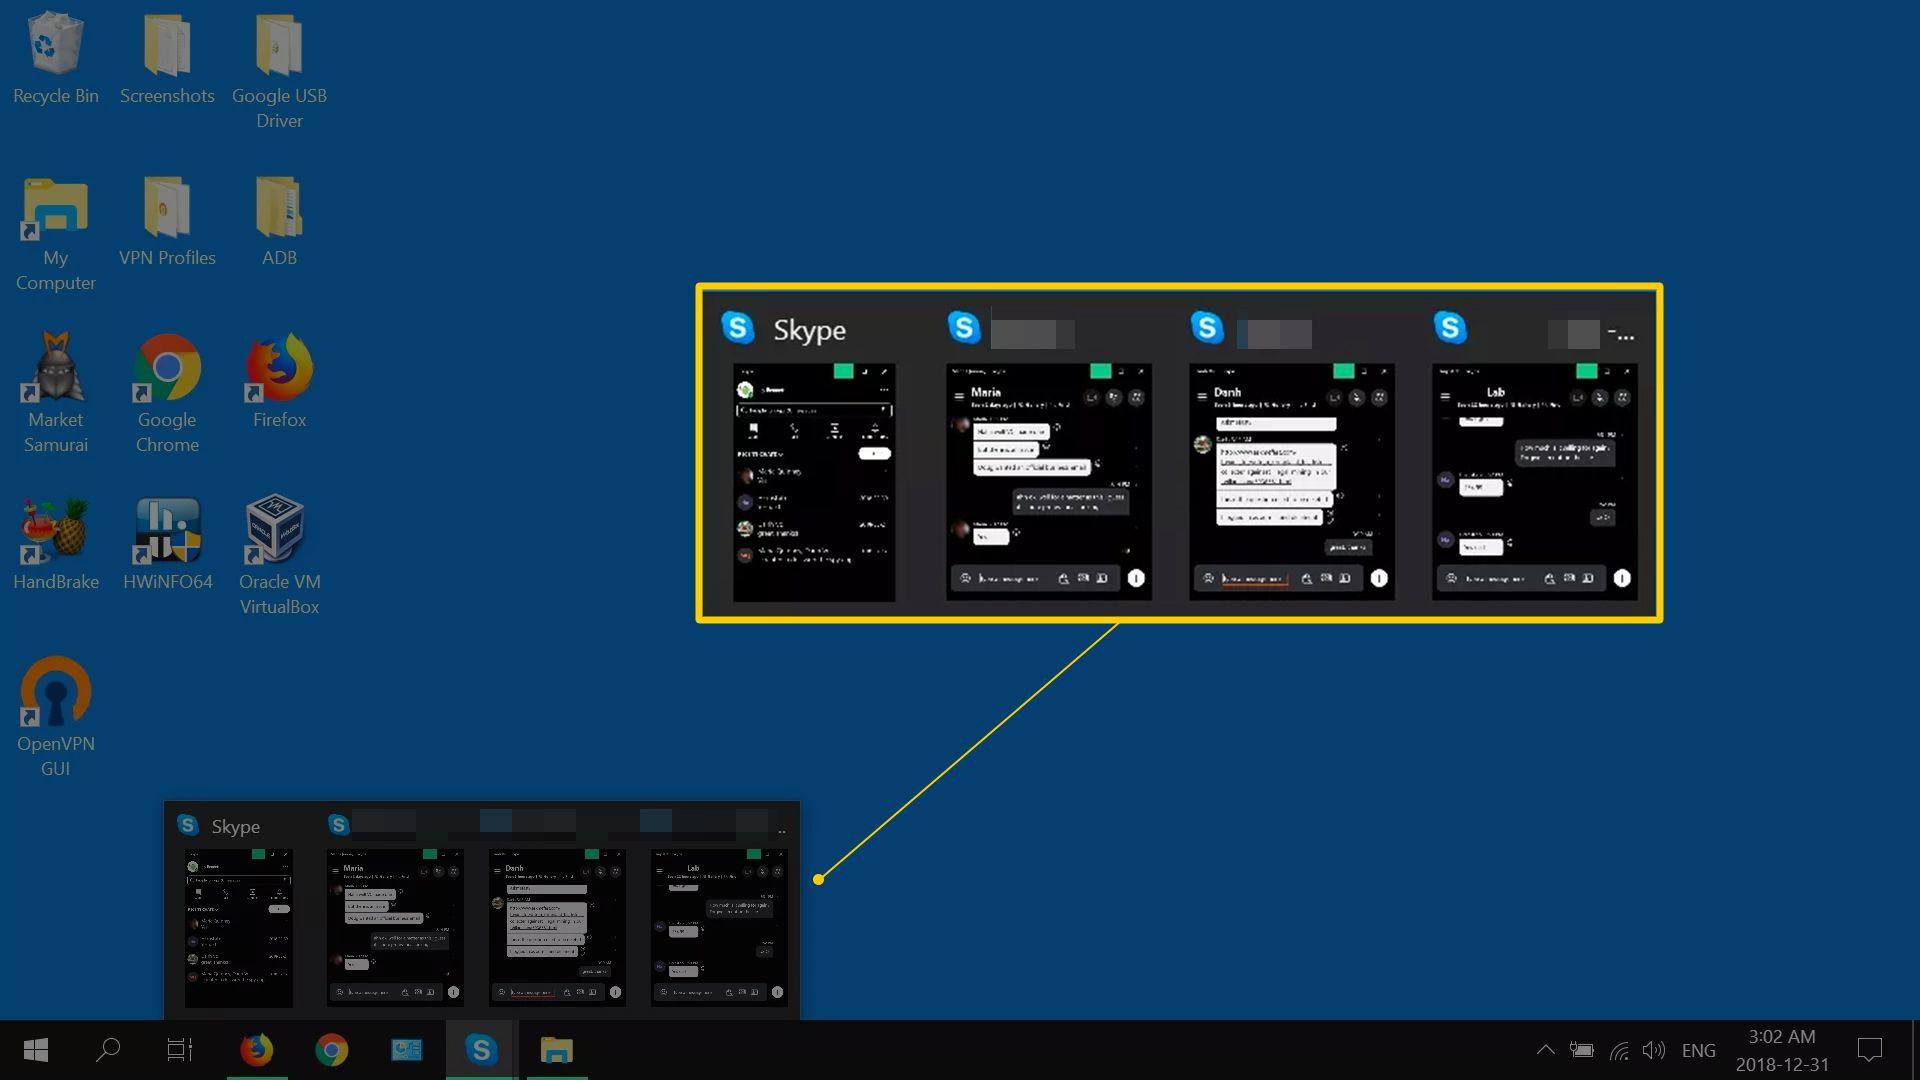 All Skype chats in the Windows taskbar